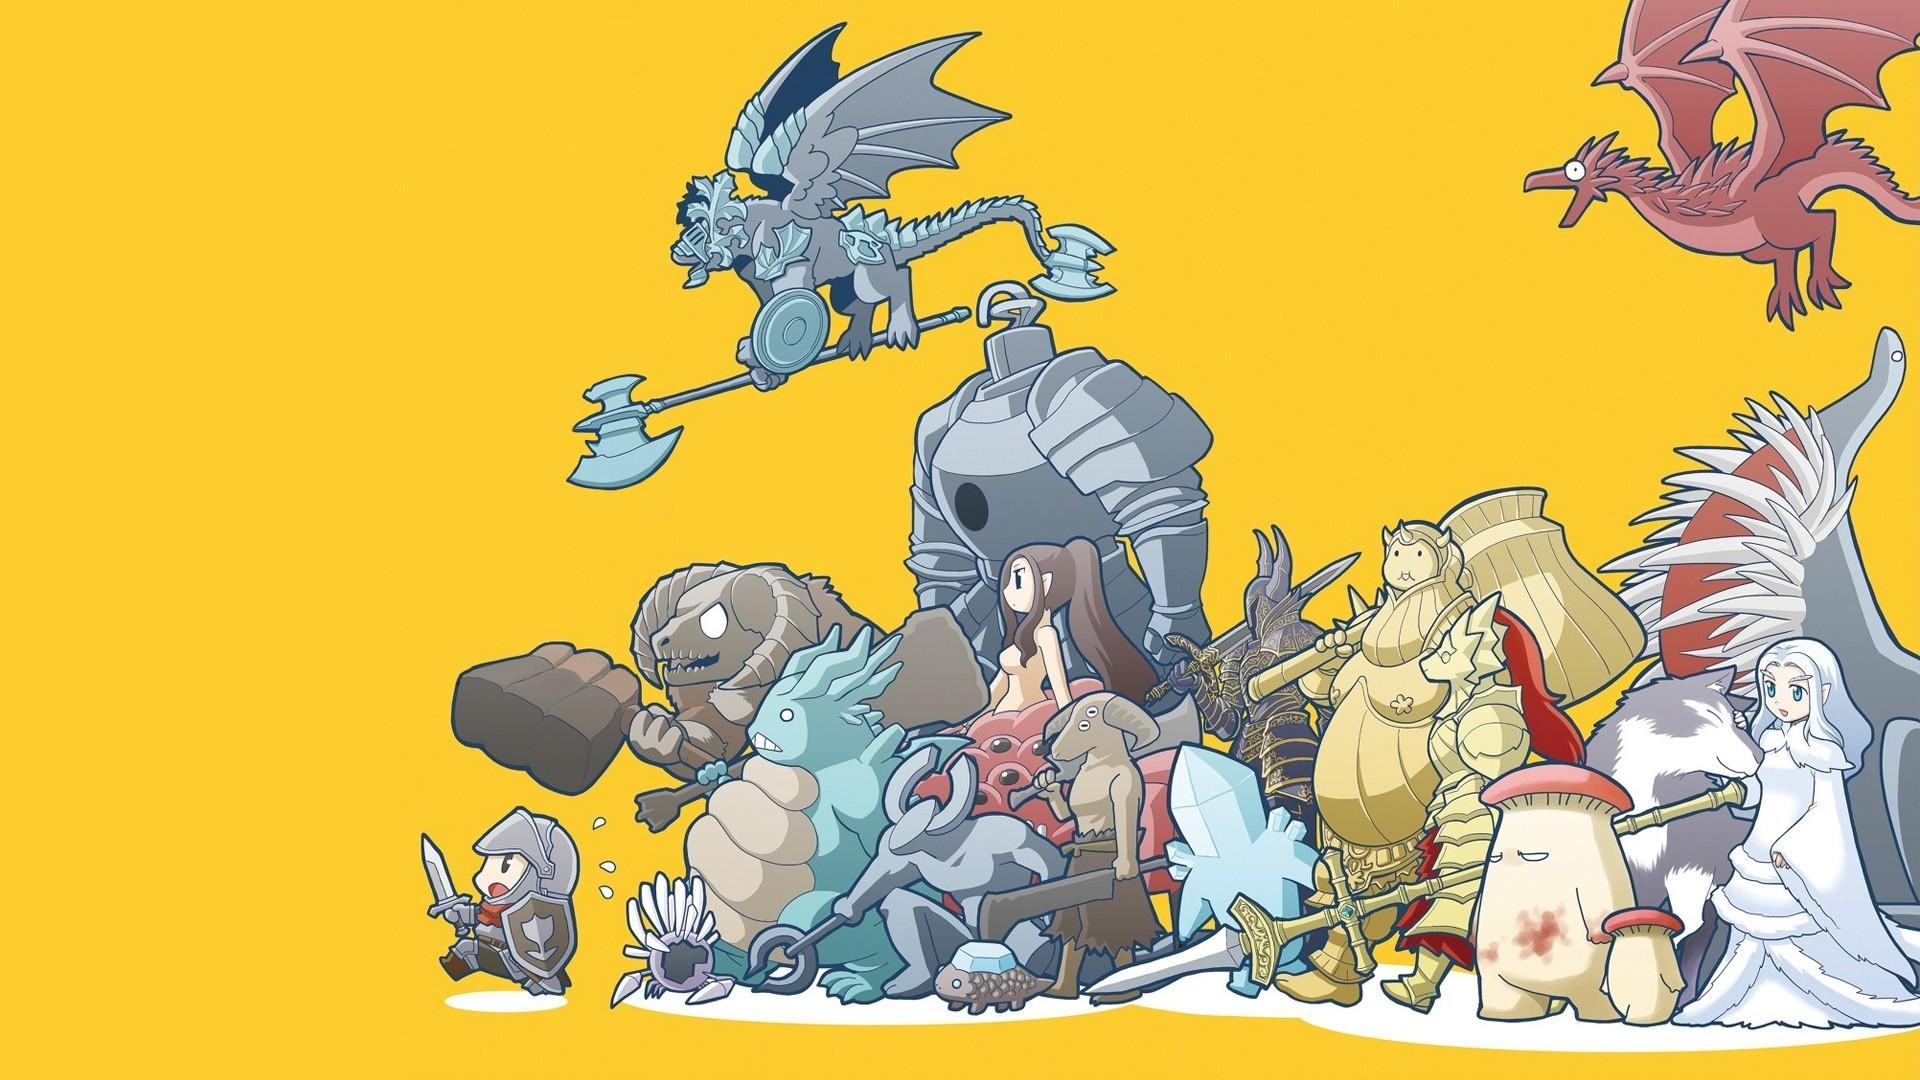 Anime 1920x1080 Dark Souls Capra Demon Sif the Great Grey Wolf Great Grey Wolf Sif Smough ornstein mushroom Dragon Slayer Ornstein video game art